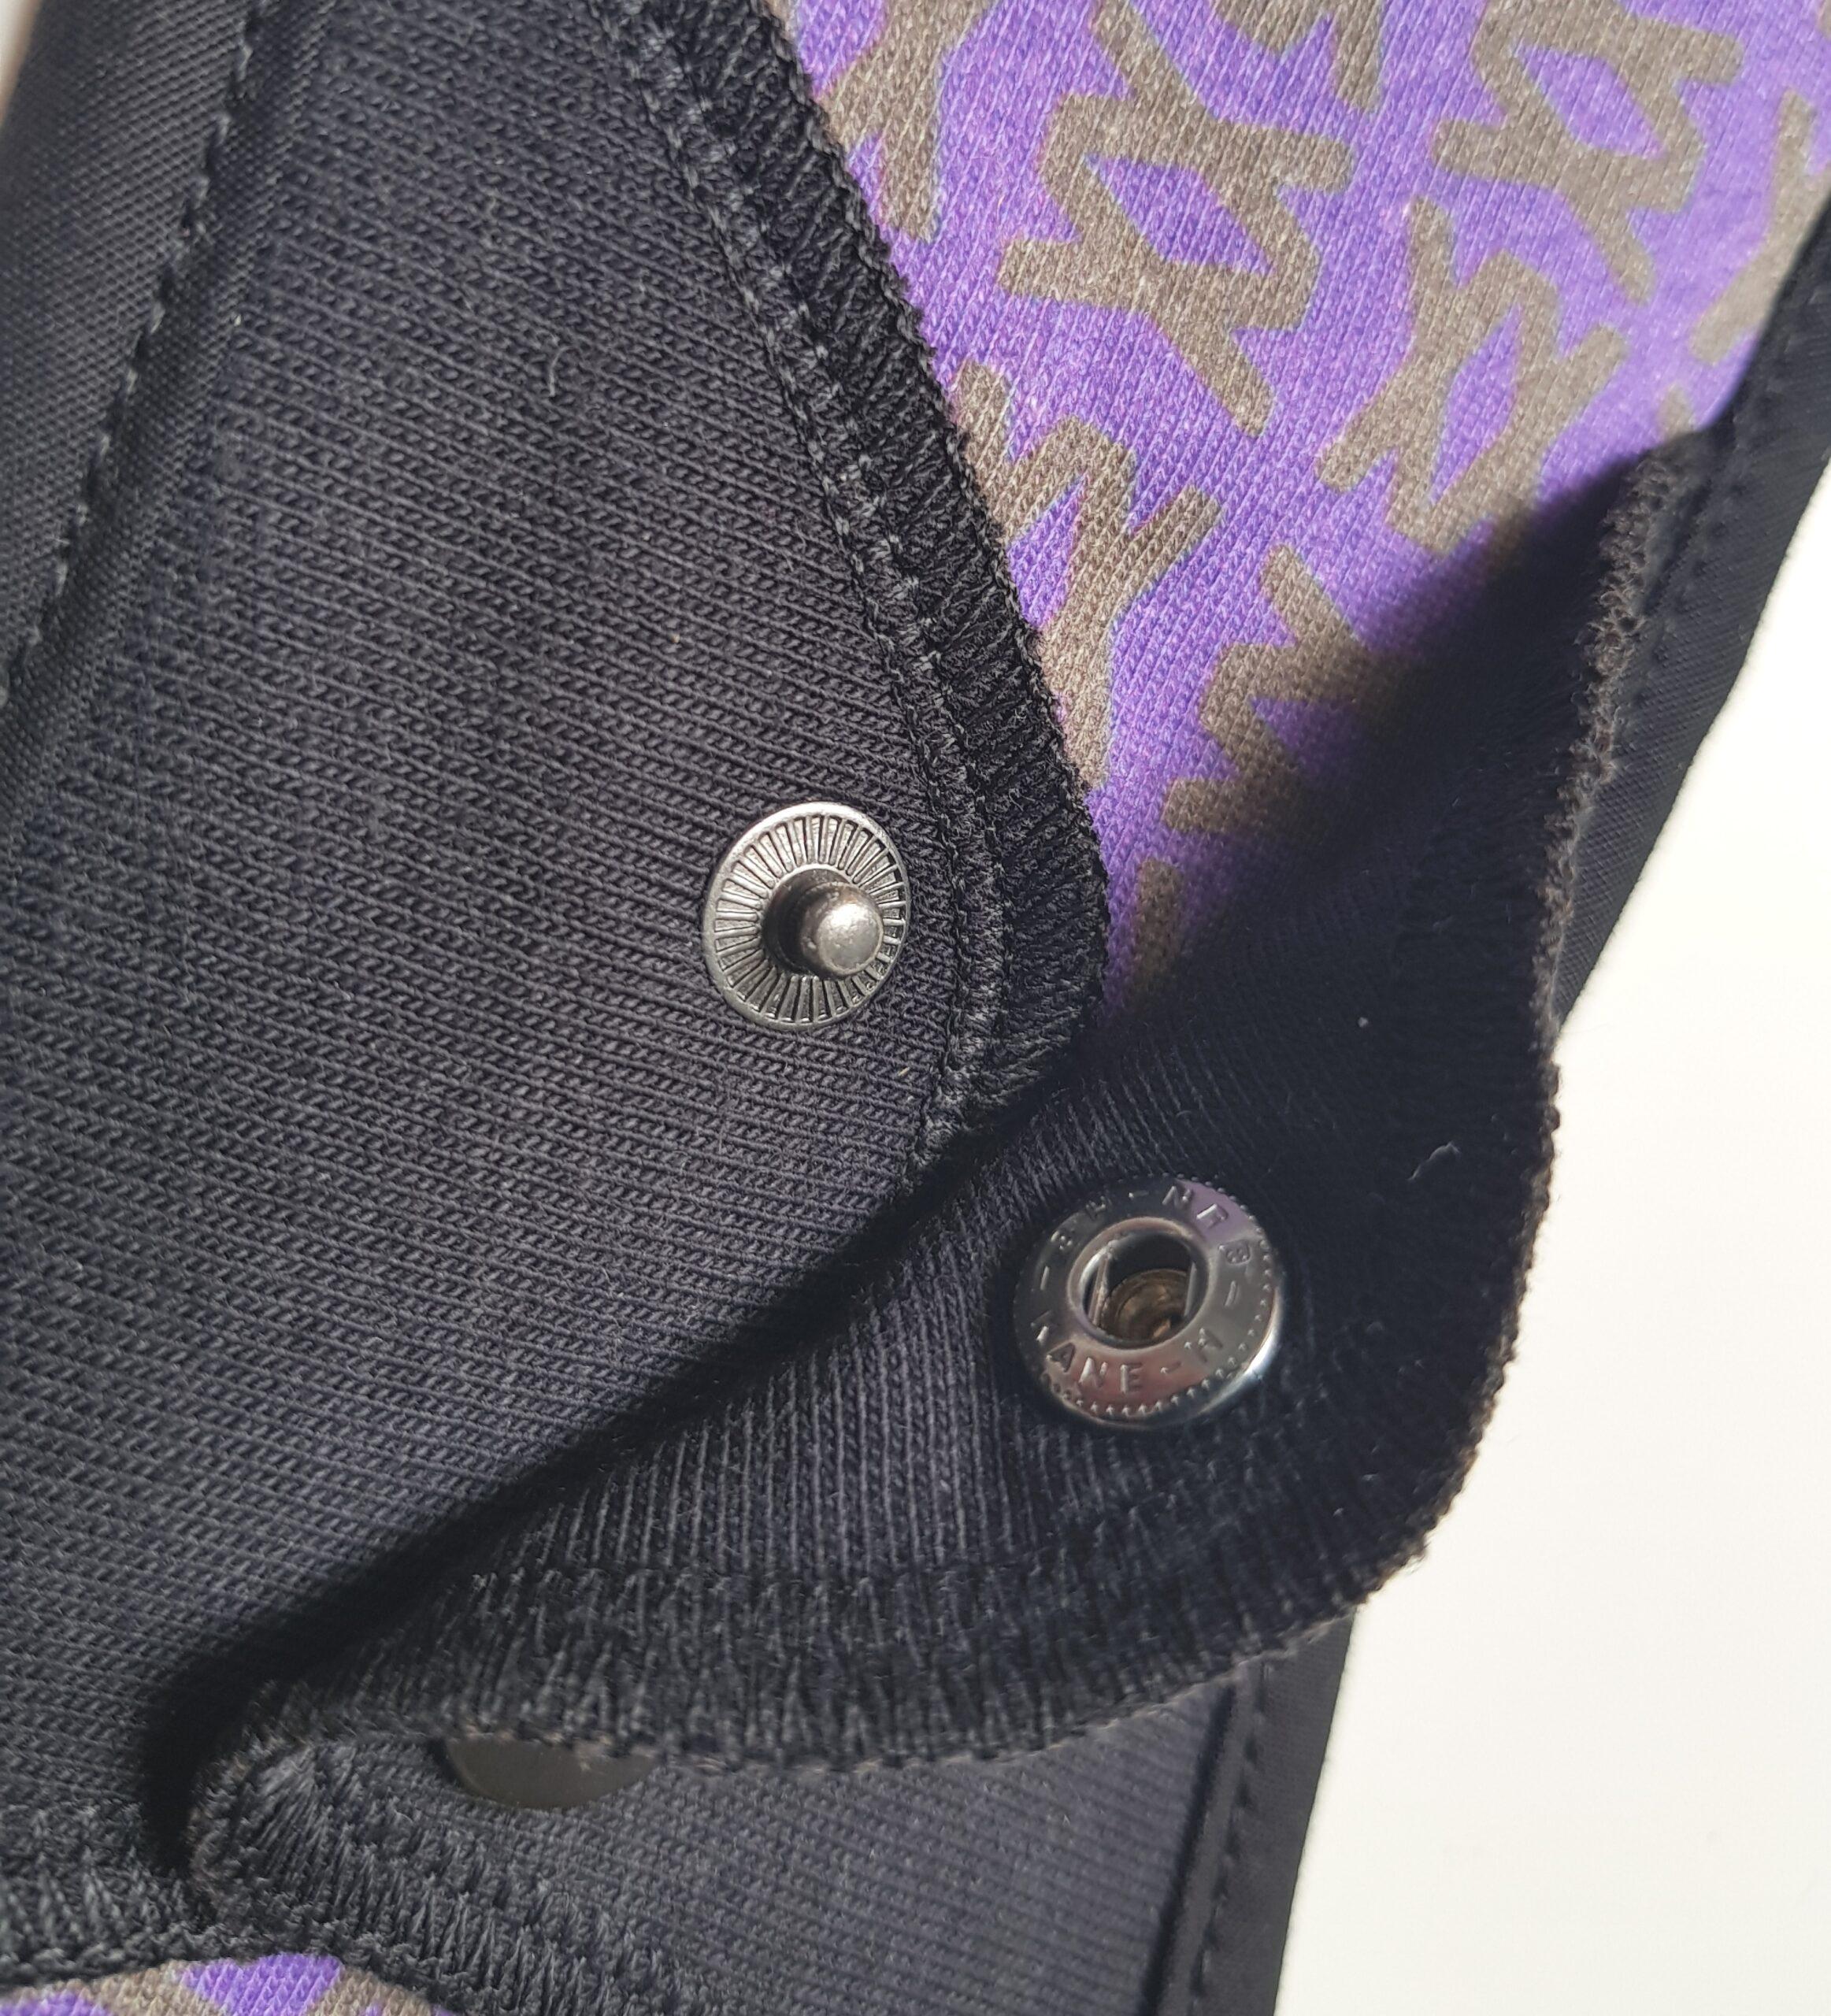 Light purple wing 2 scaled - New super slim reusable menstrual pads